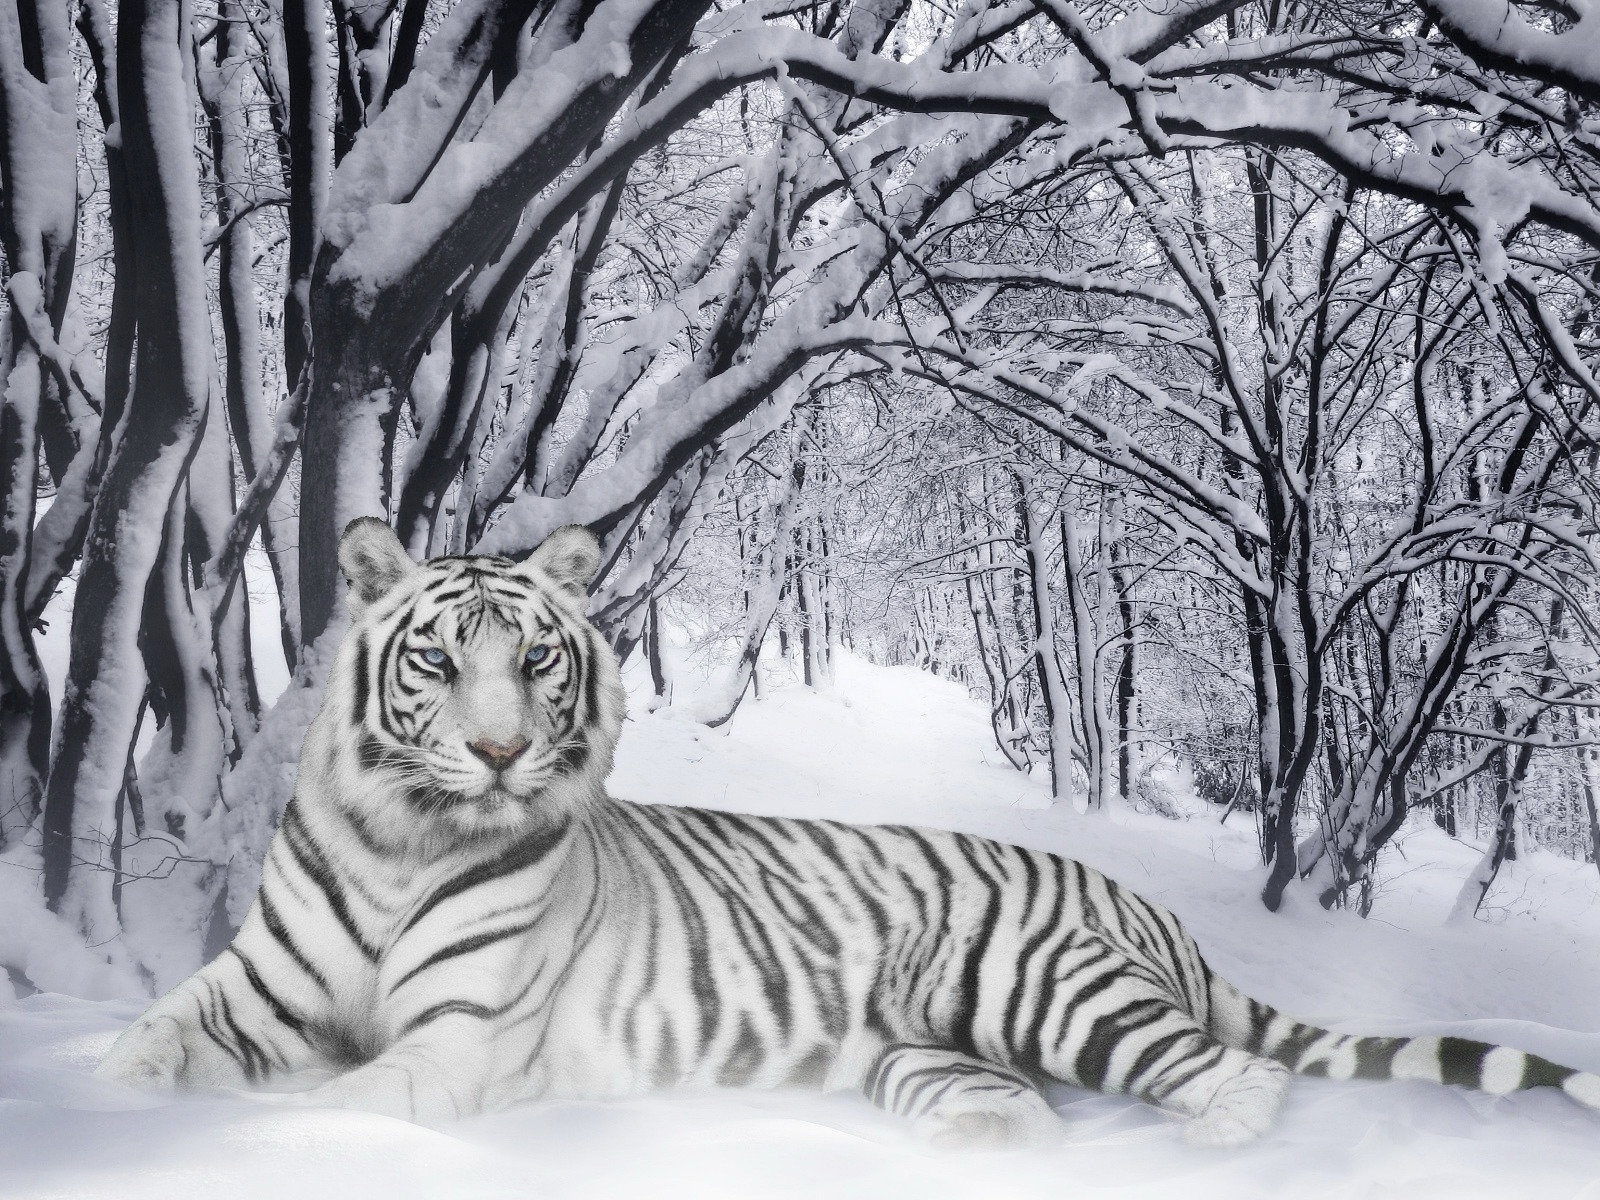 bengal tigers wallpaper animals wallpaper